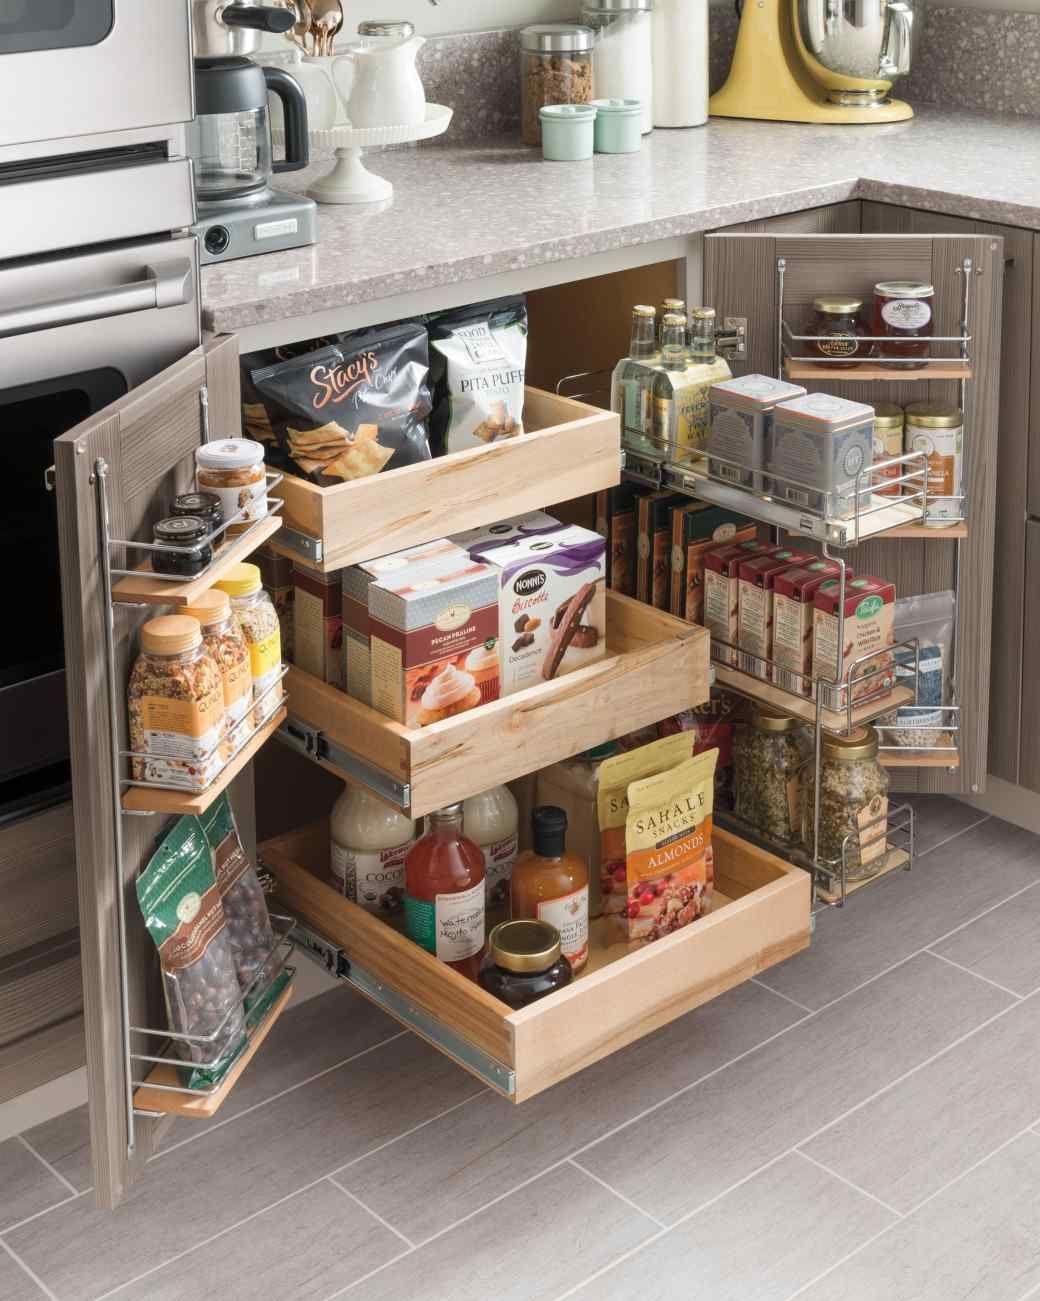 say goodbye to kitchen storage problems when you renovate your kitchen